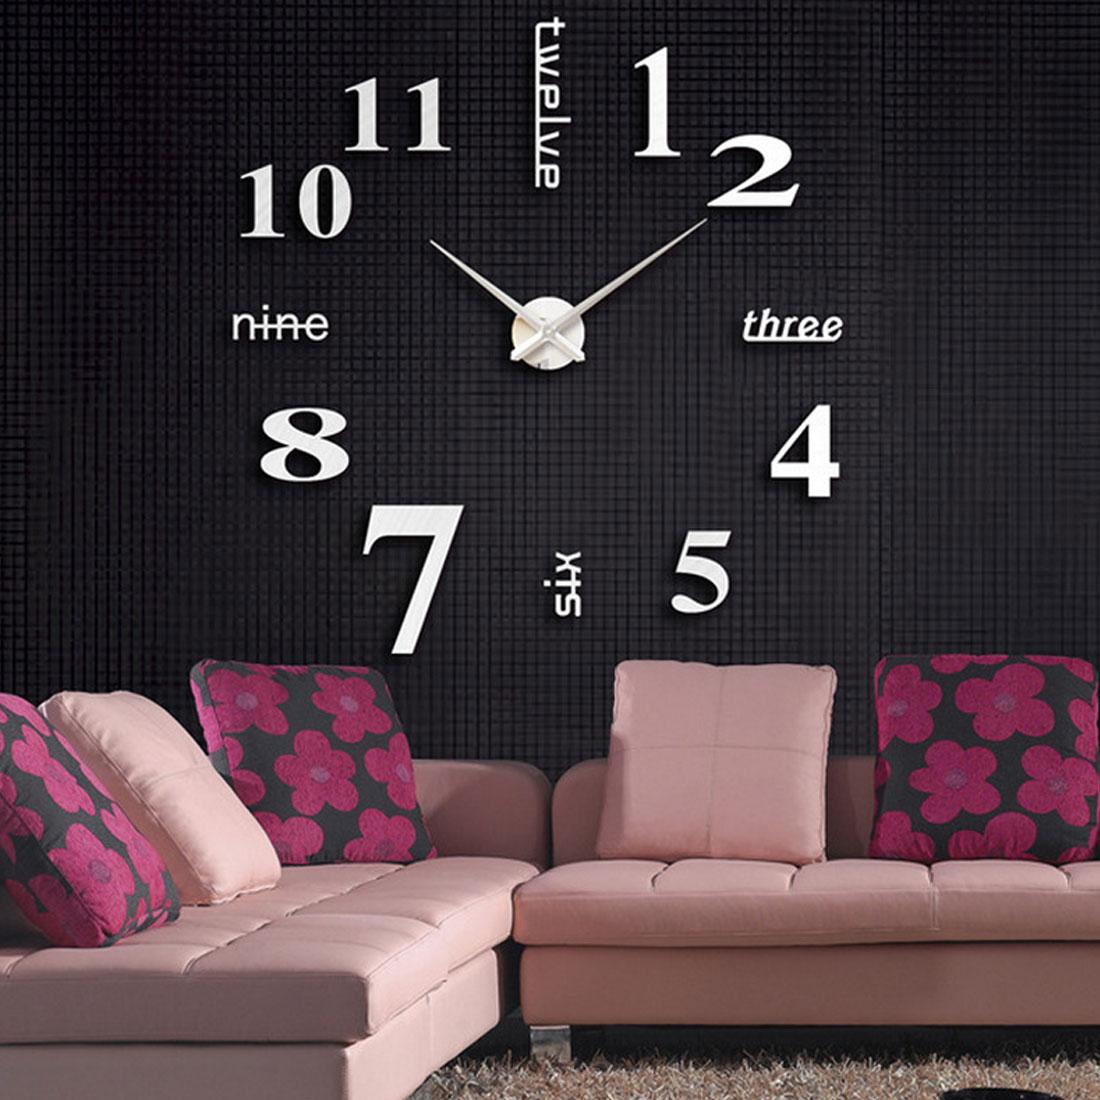 DIY Quartz clocks fashion watches 3D real big wall clock rushed mirror sticker diy living room decor free shipping in Wall Clocks from Home Garden